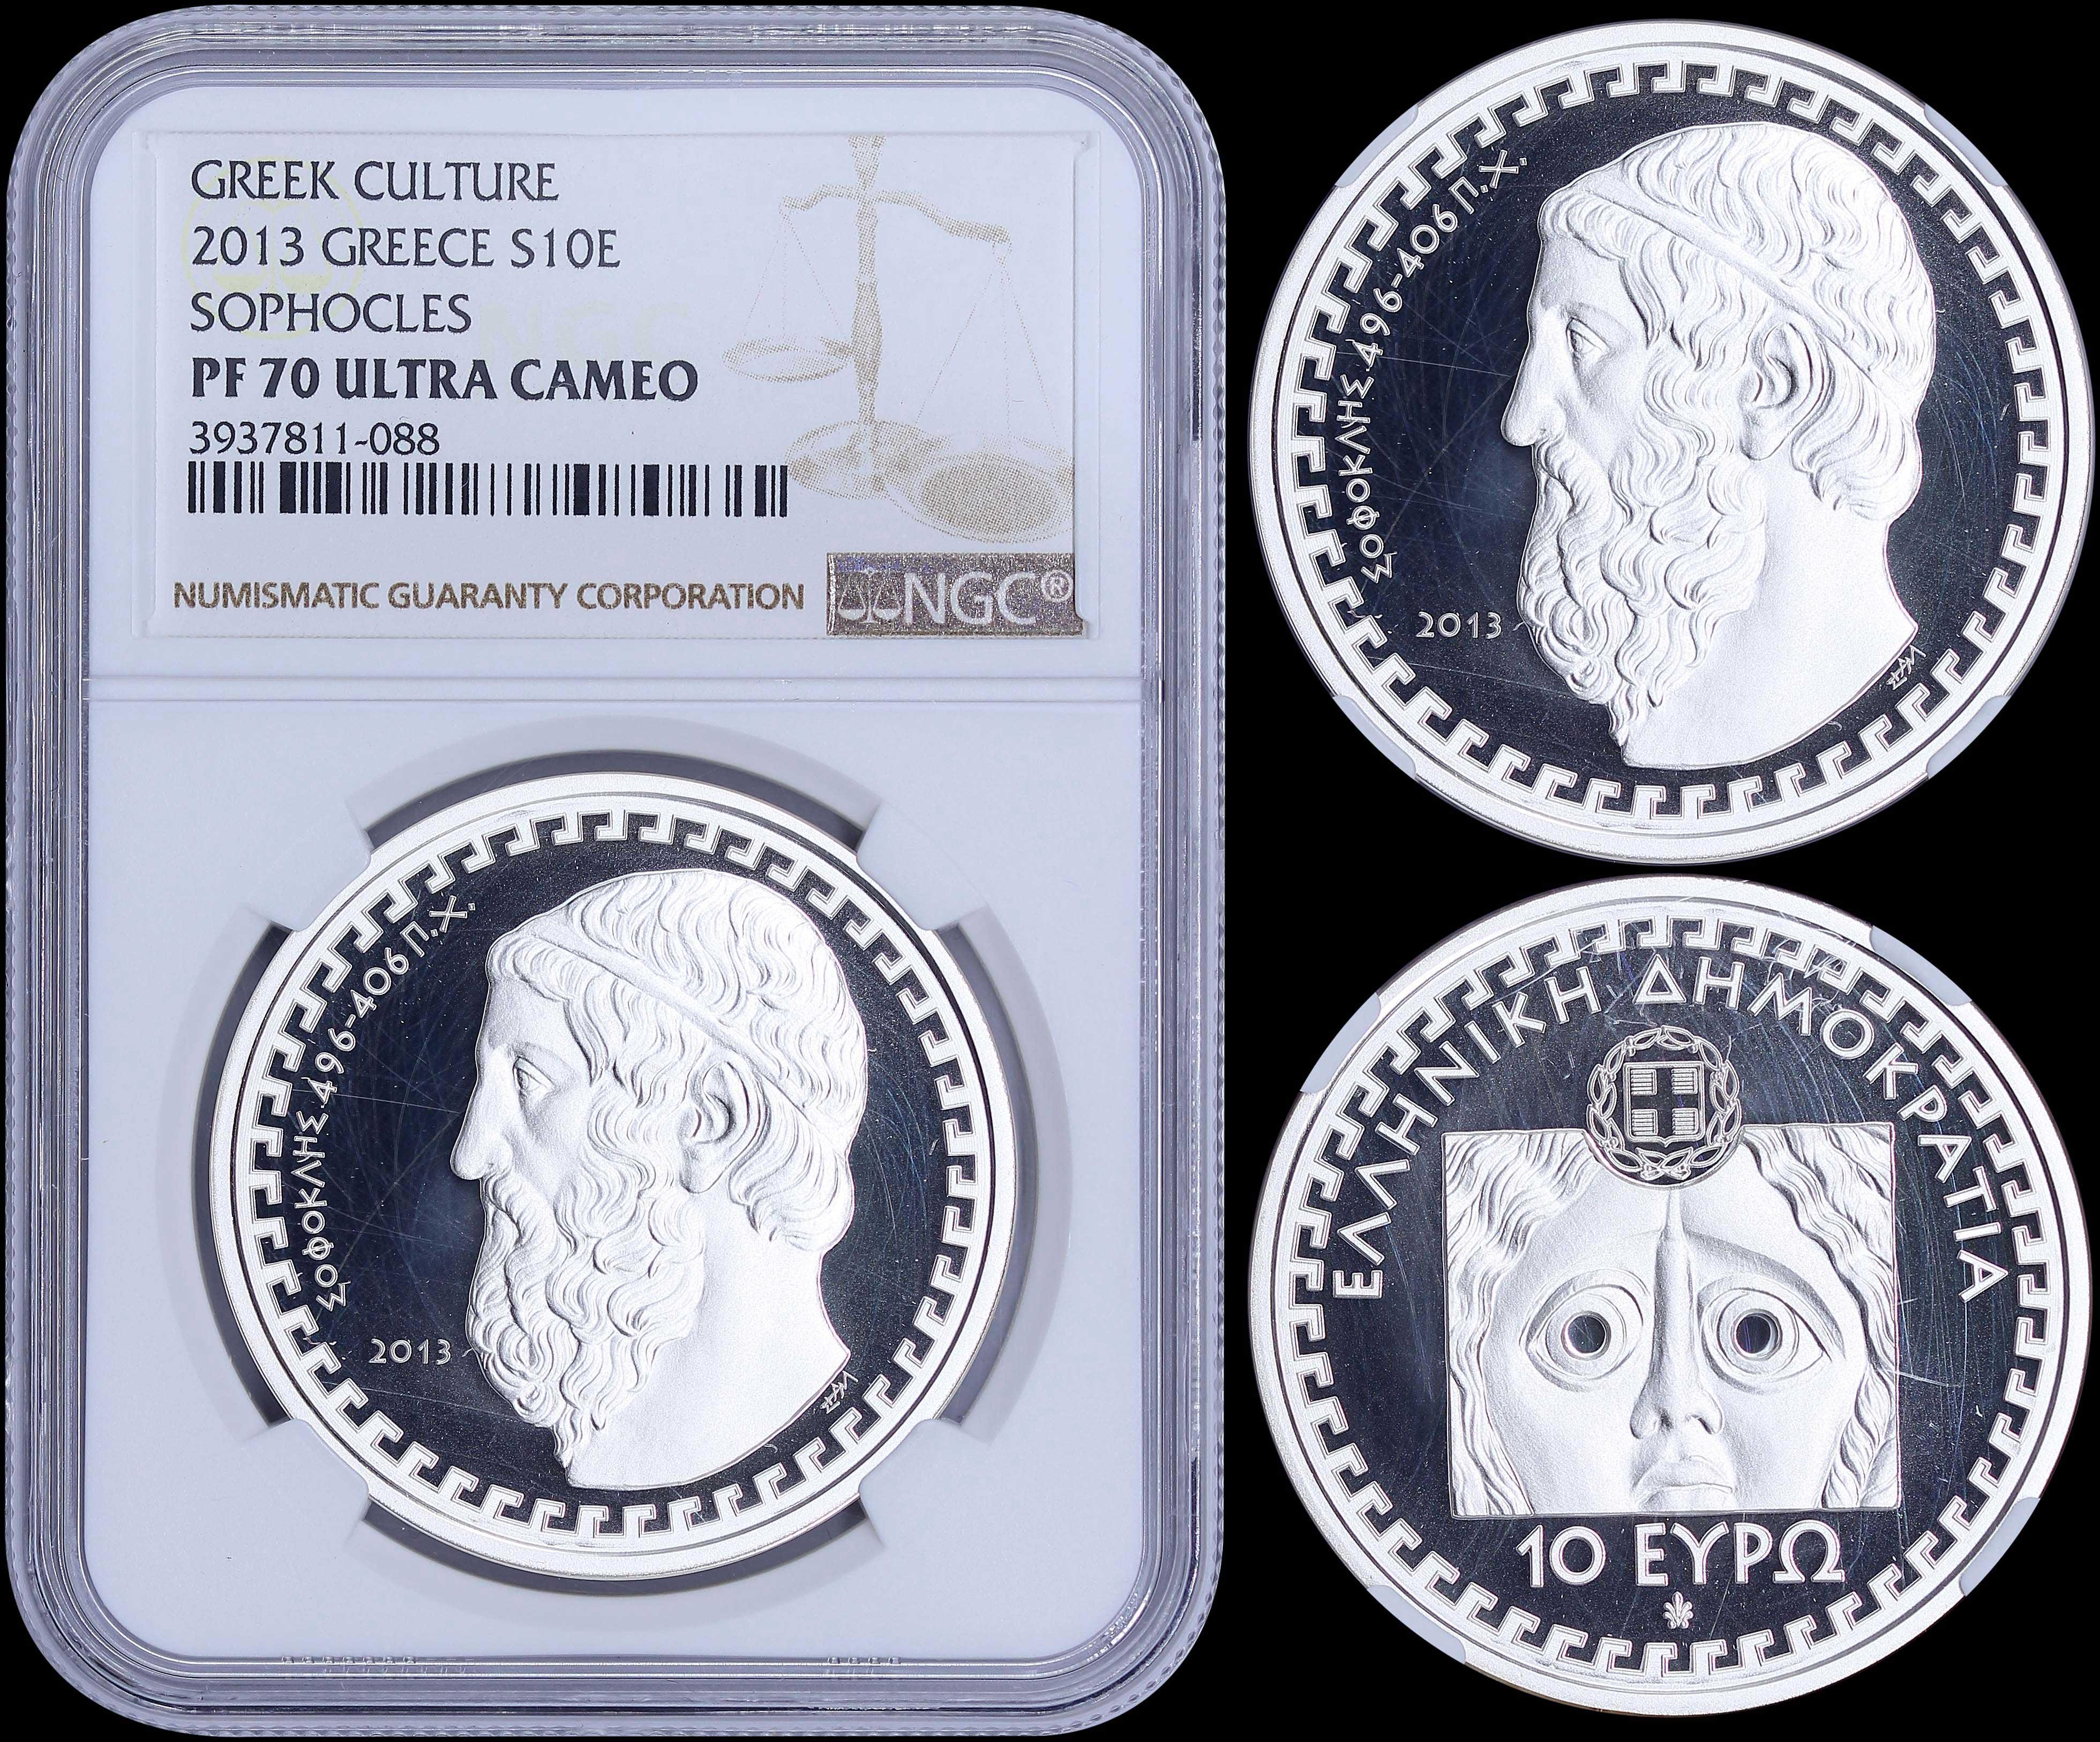 Lot 6226 - -  COINS & TOKENS HELLENIC REPUBLIC & COMMEMORATIVE ISSUES -  A. Karamitsos Public & Live Internet Auction 665 Coins, Medals & Banknotes